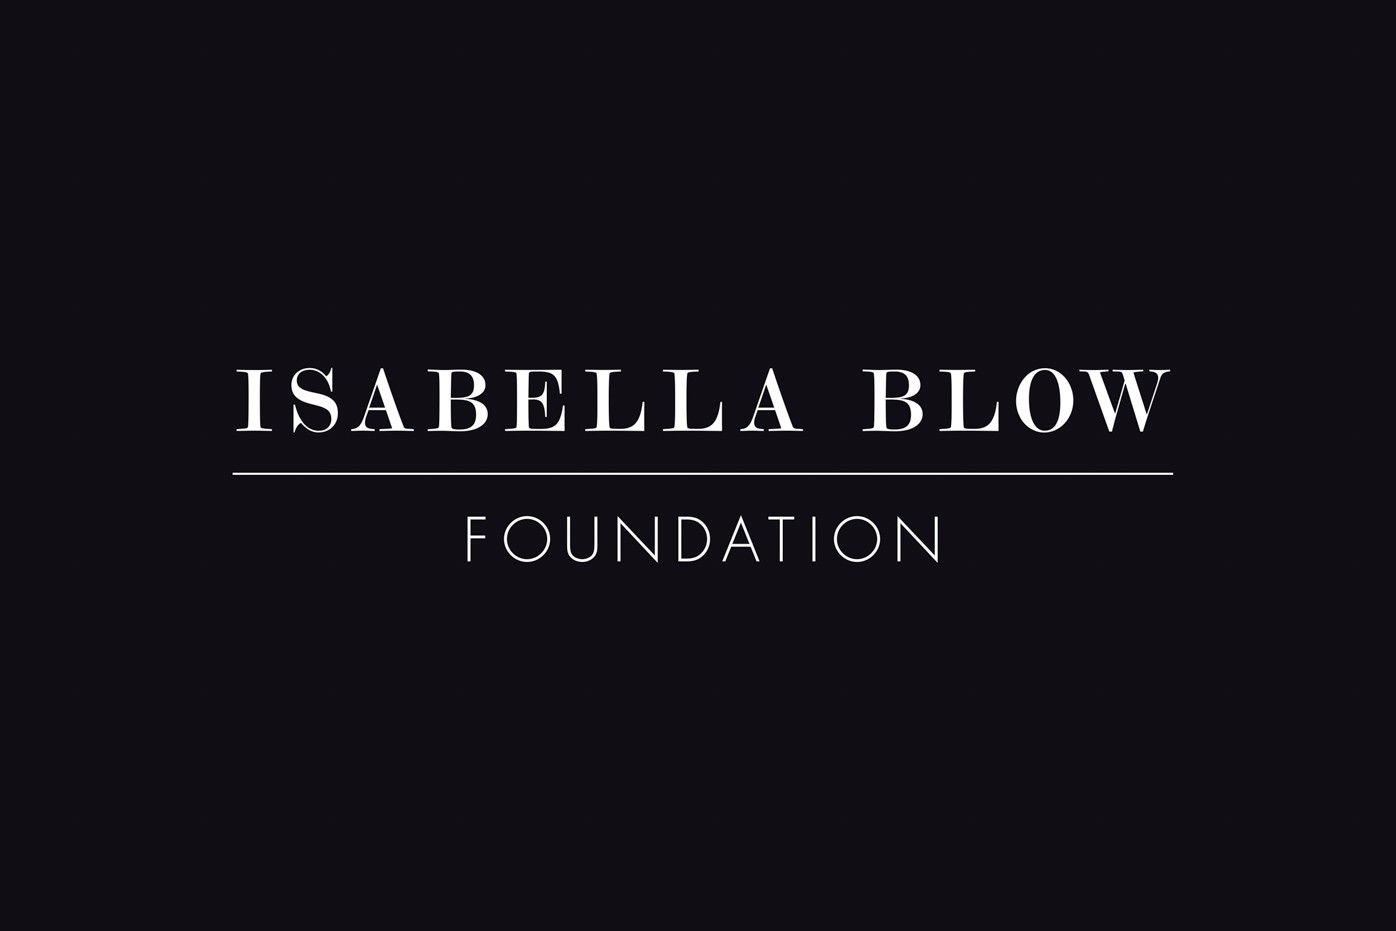 StudioSmall-Isabella_Blow-3.jpg